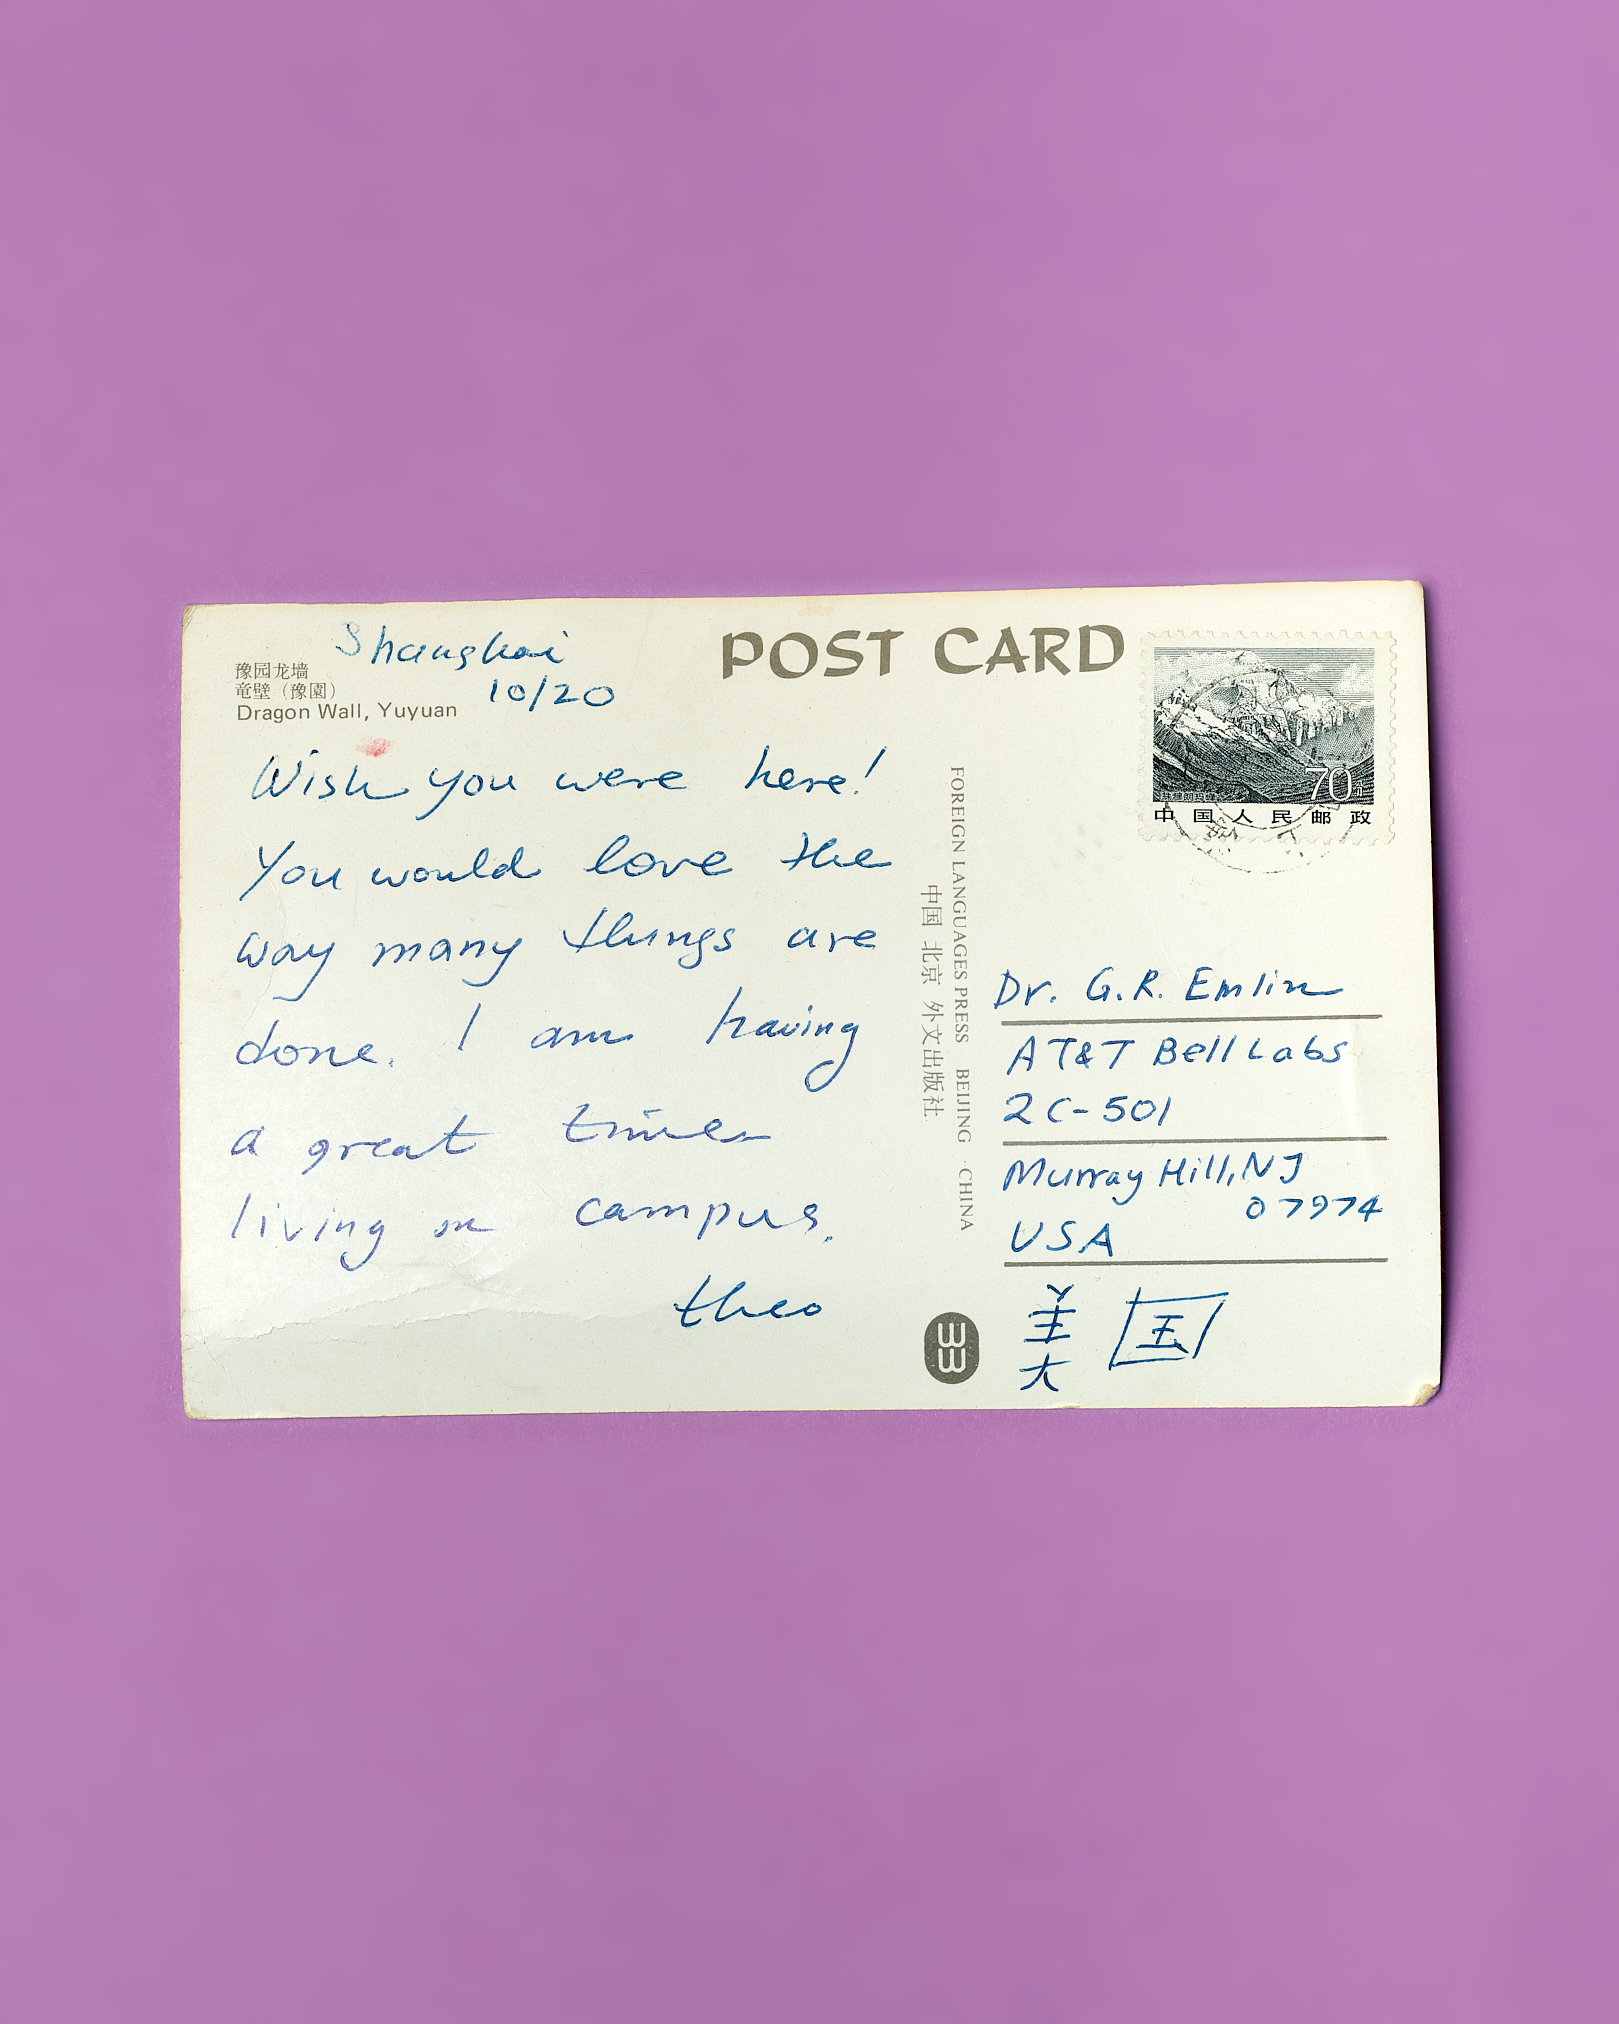 Gremlin Post Card by Peter Adams.